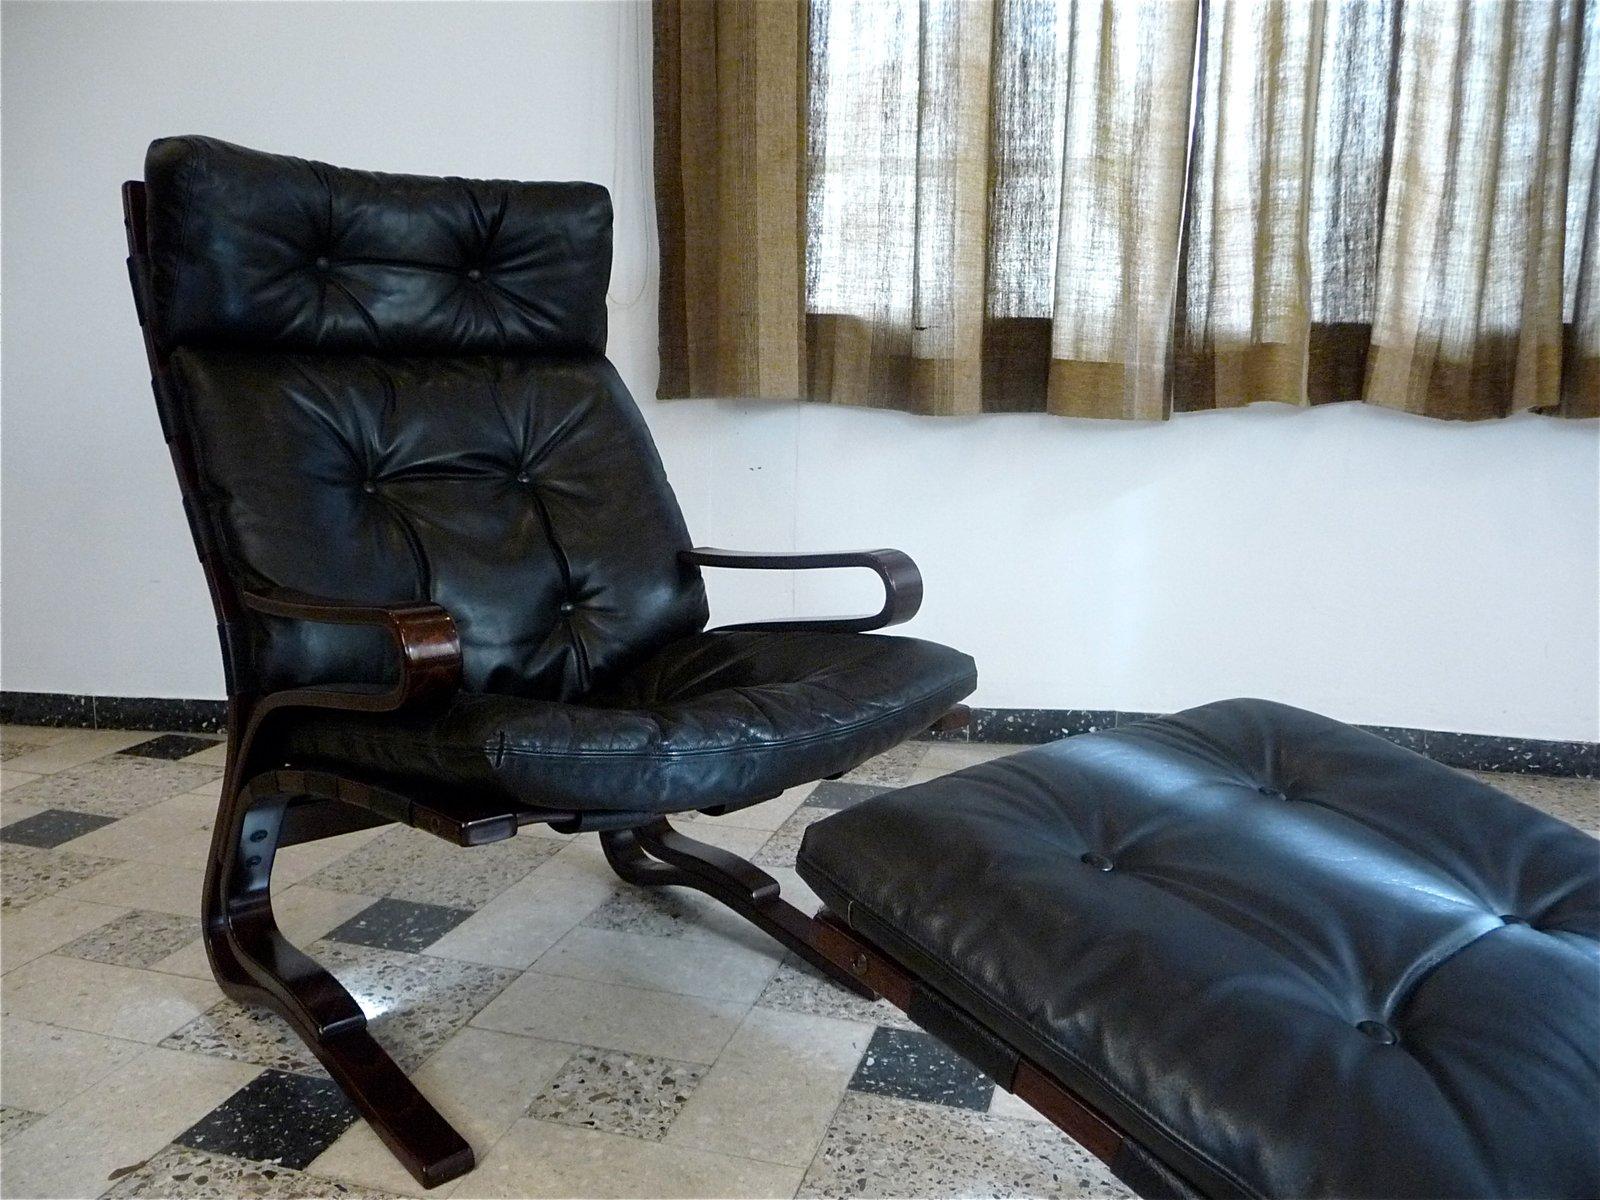 Kengu Leather Lounge Chair u0026 Foot Stool by Elsa u0026 Nordahl Solheim for Oddvin Rykken 1960s & Kengu Leather Lounge Chair u0026 Foot Stool by Elsa u0026 Nordahl Solheim ... islam-shia.org